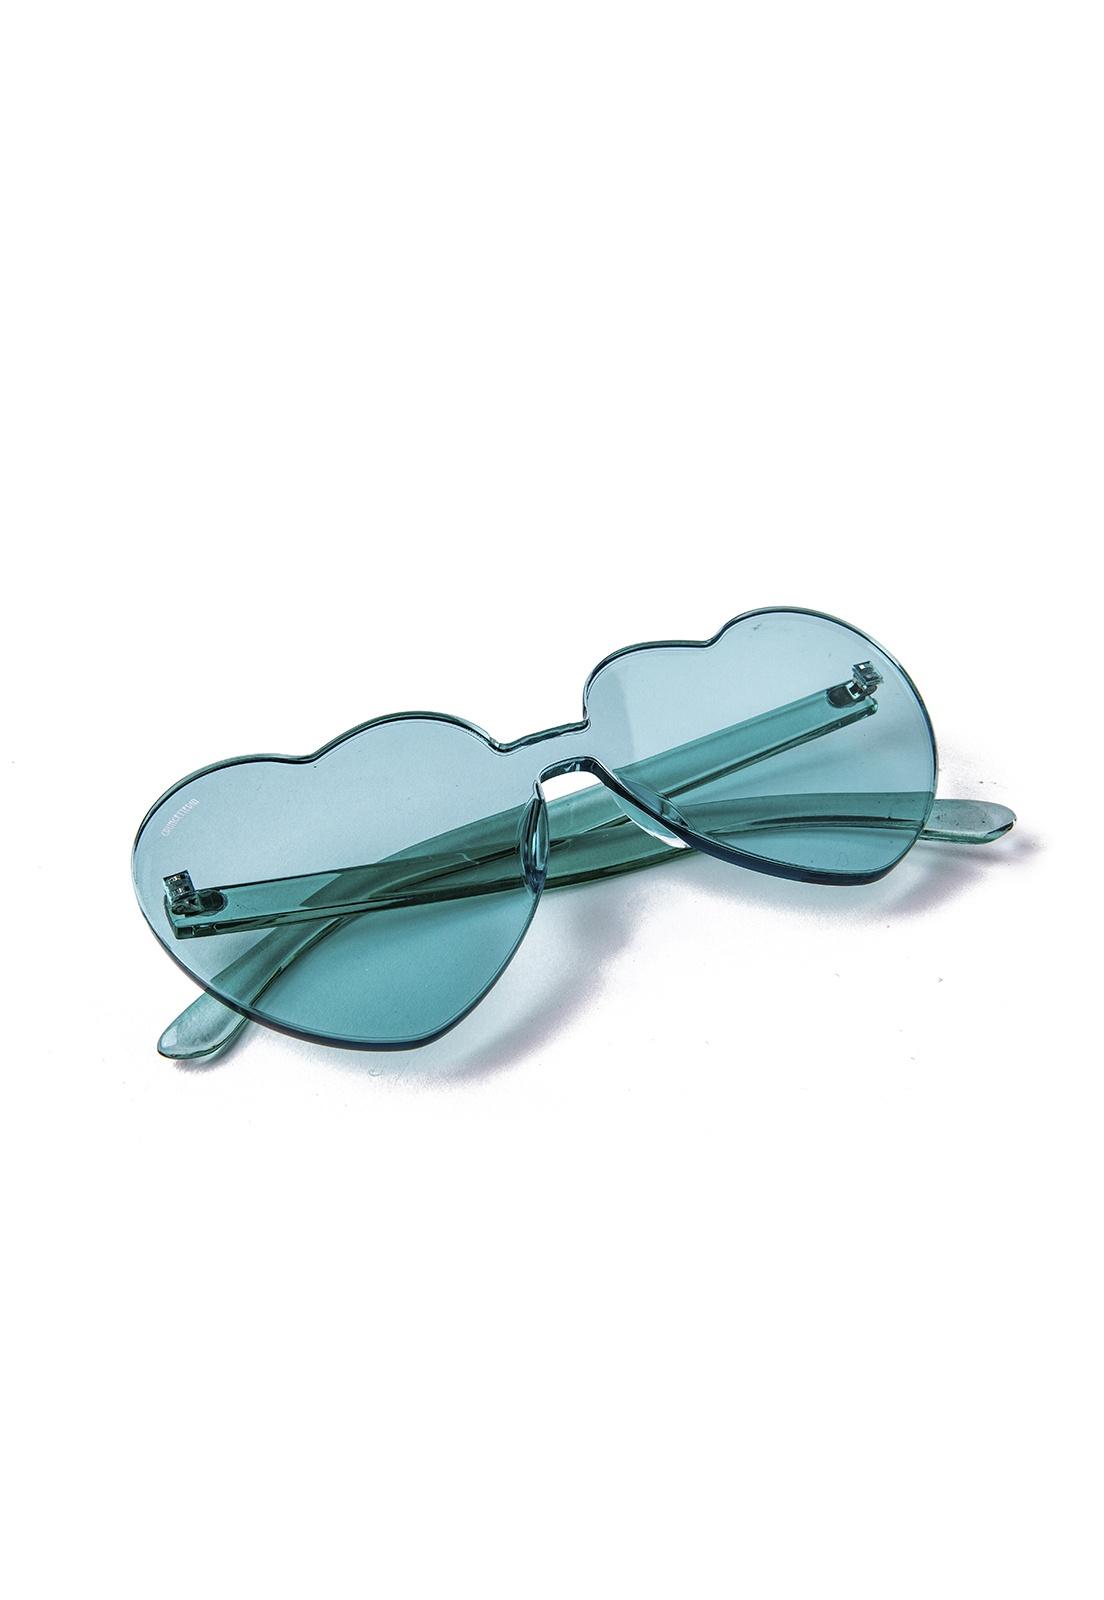 Óculos de Sol Grungetteria Love Turquesa